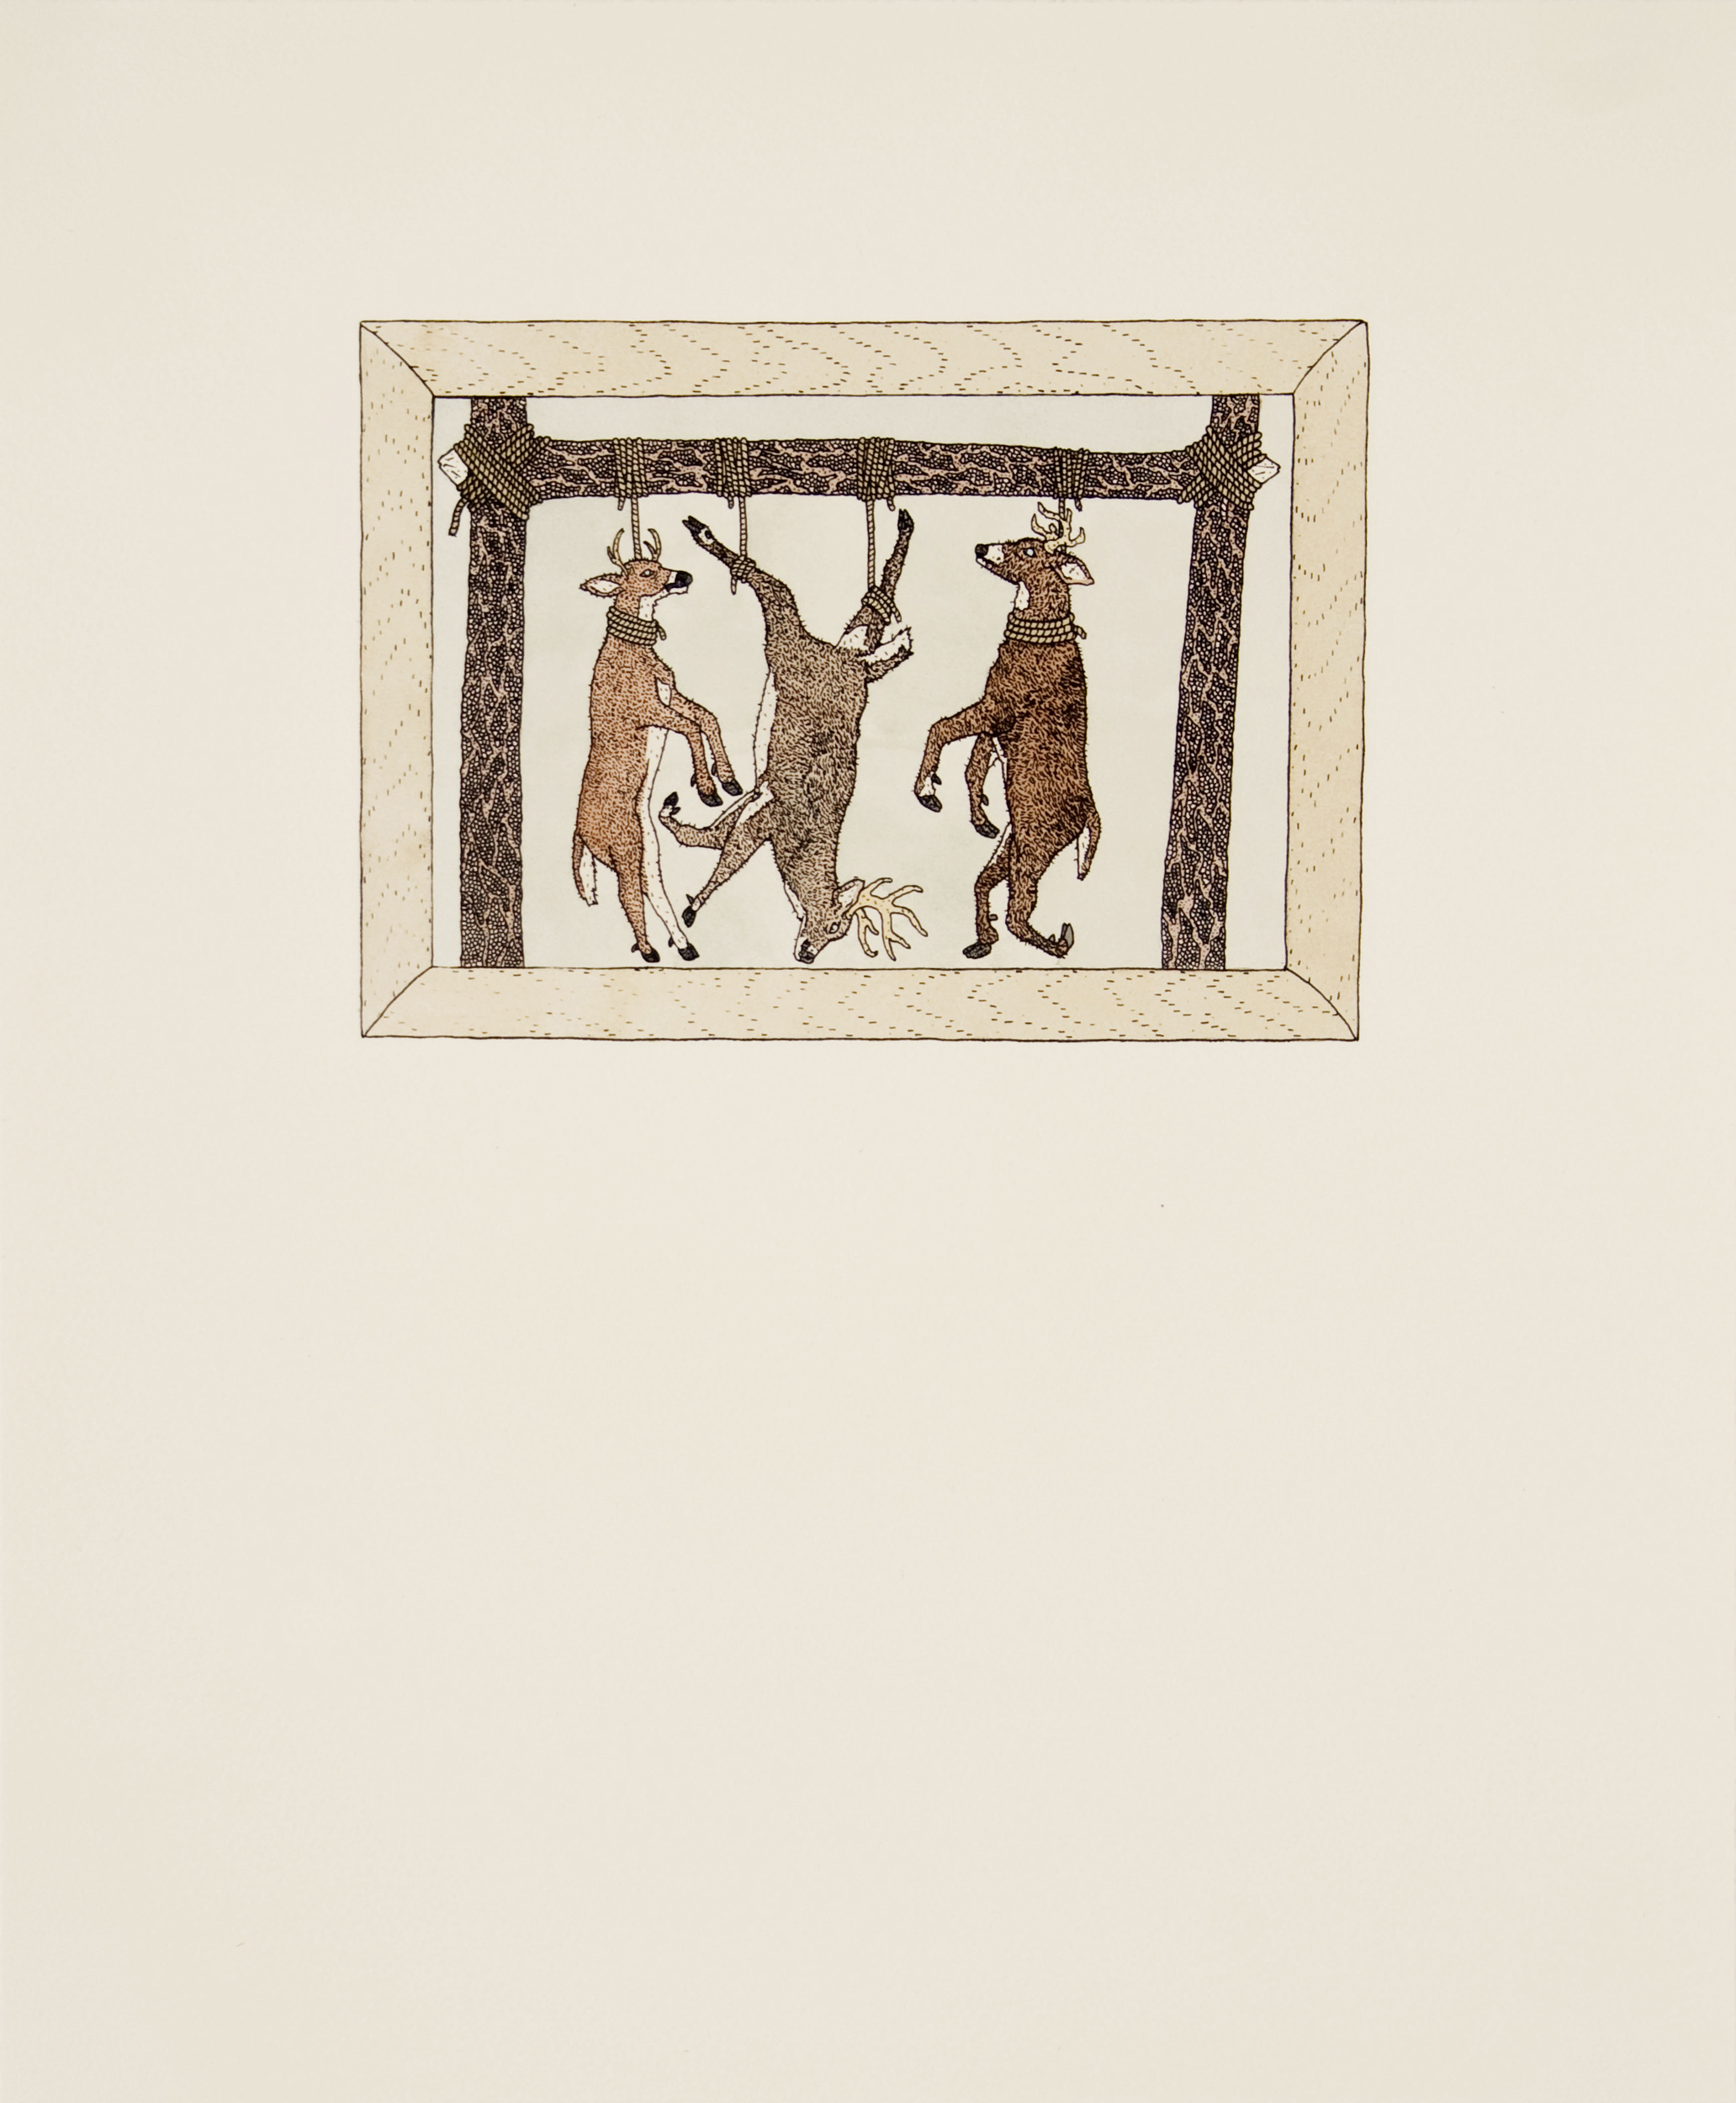 """3 Deer"" by Patrick Smyczek. Screen print and watercolor, 16.5"" x 20"" (2012)"